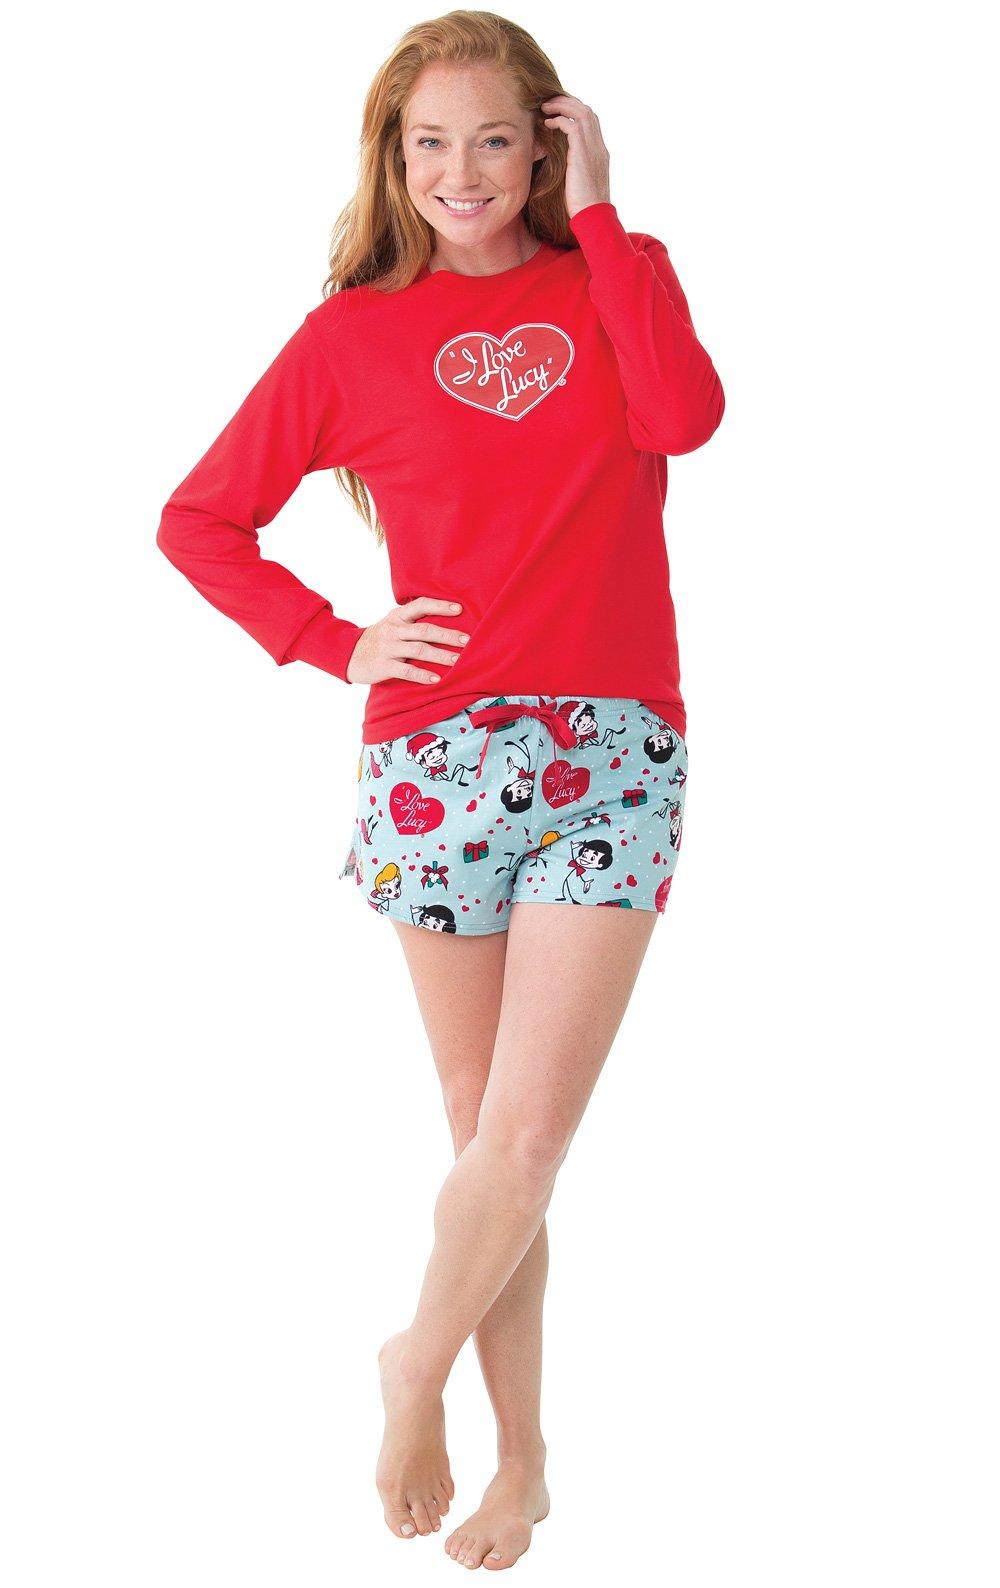 PajamaGram I Love Lucy Christmas Short Set Pajamas for Women, Red, MED (8-10)